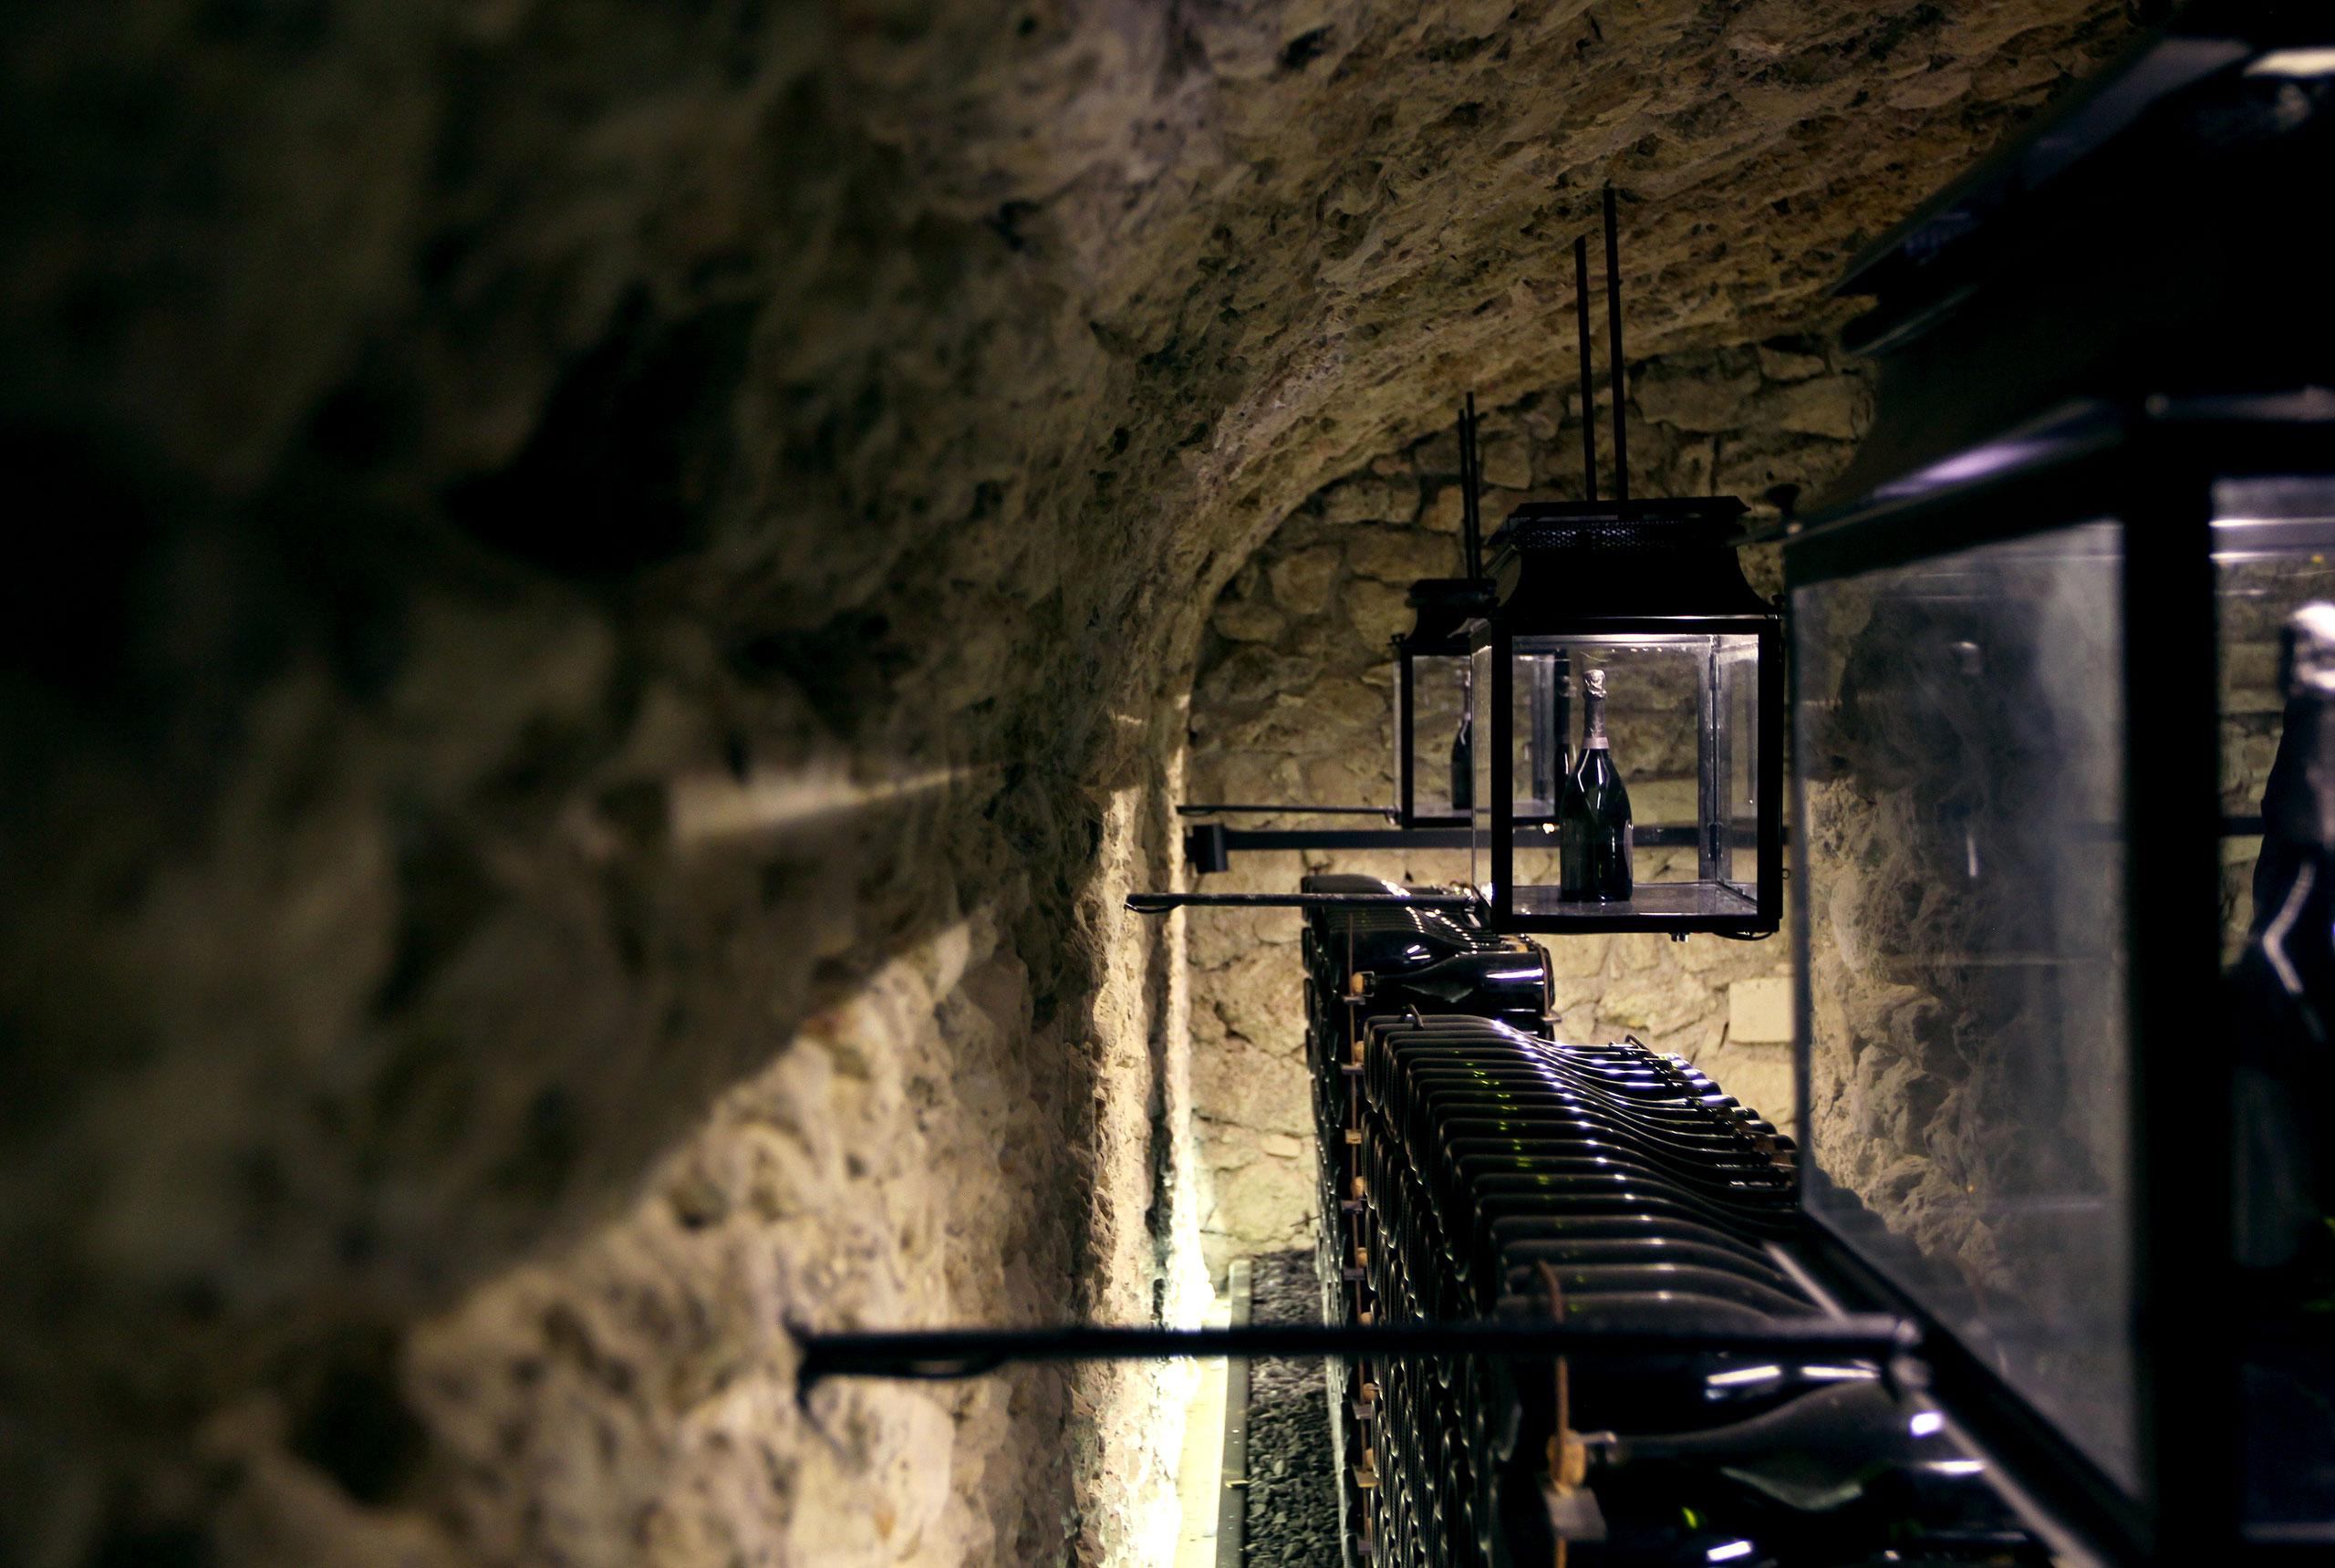 Dom Pérignon champagne cellars atthe Abbey of Saint-Pierre in Hautvillers, France. Photoby Costas Voyatzis for Yatzer.